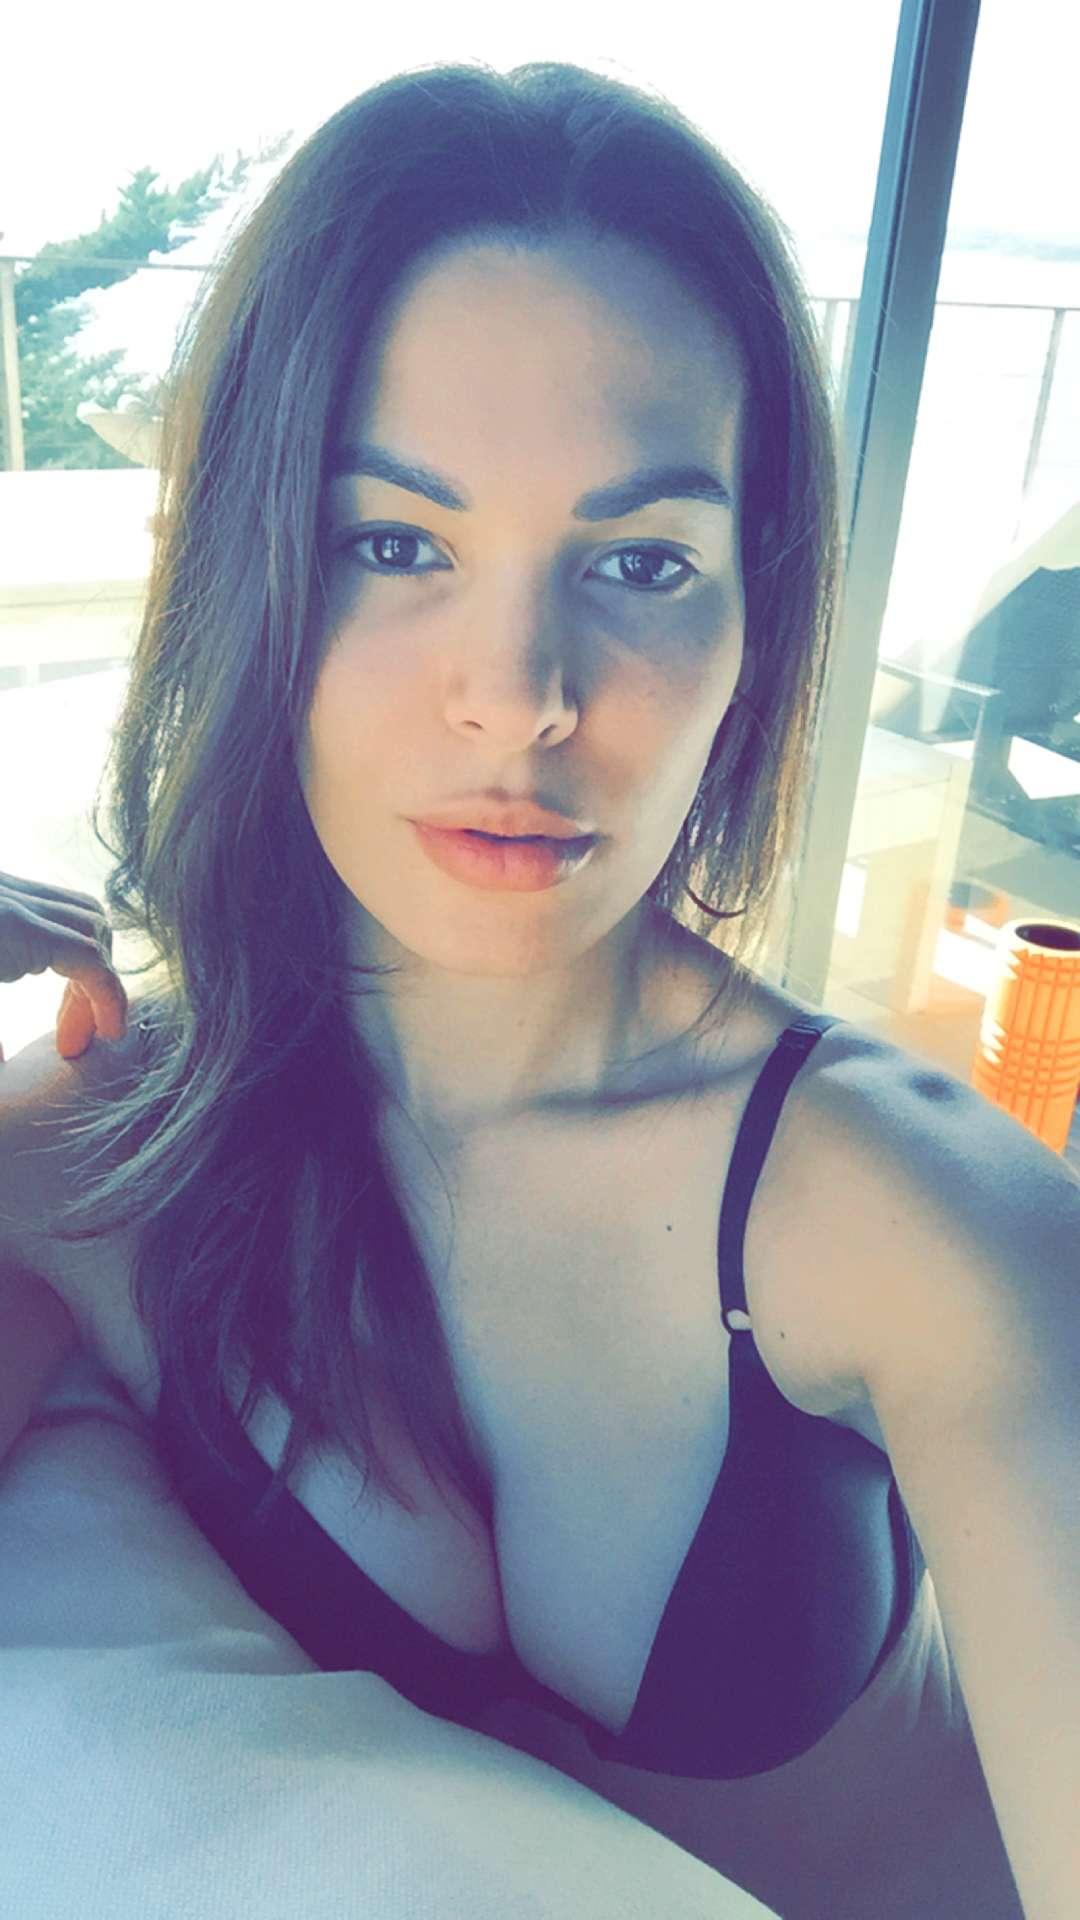 Selfie Nadine Velazquez nudes (22 photos), Sideboobs